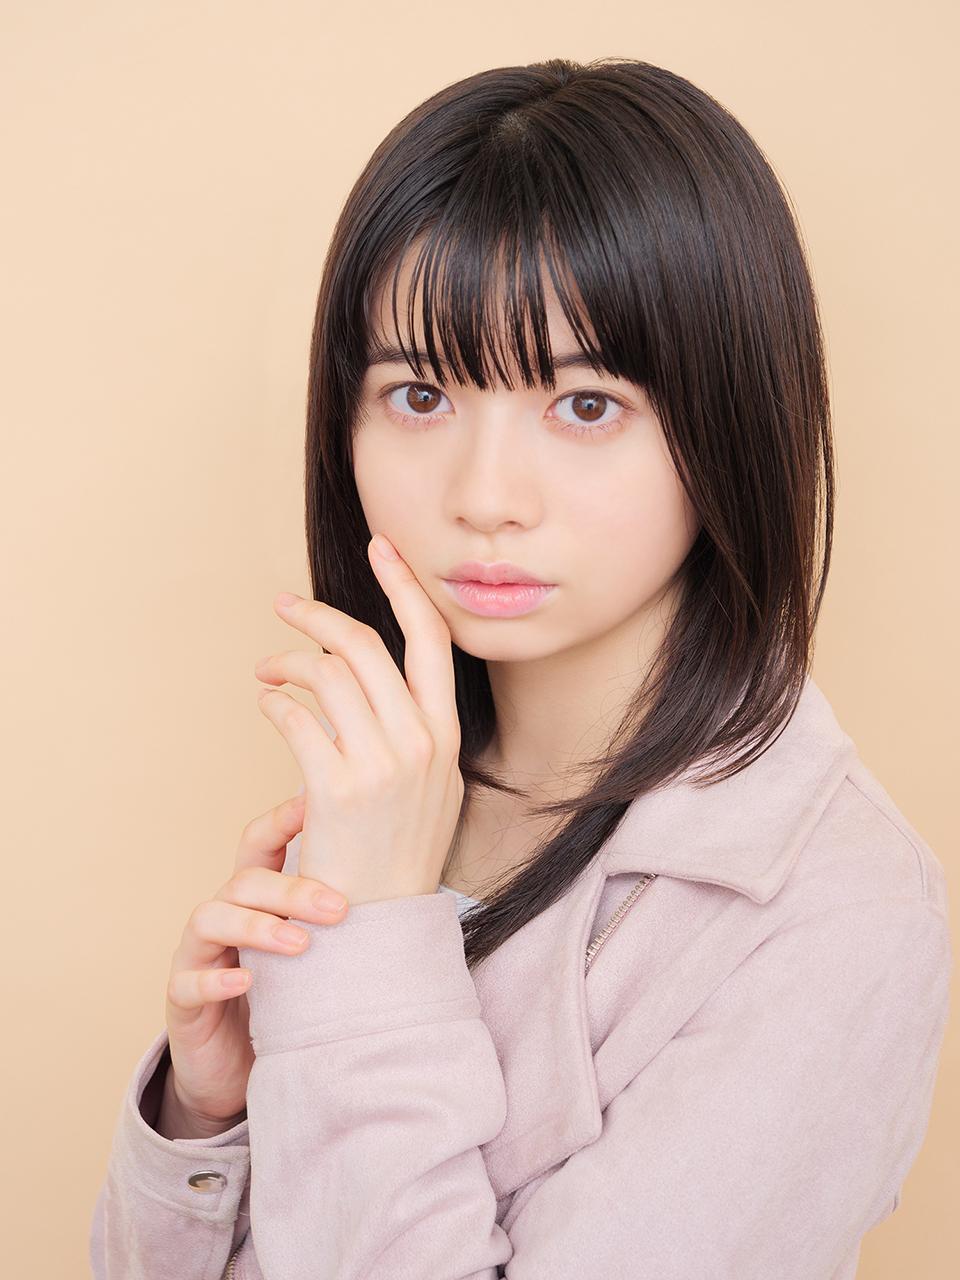 PICK UP ACTRESS 森七菜 | HUSTLE PRESS OFFICIAL WEB SITE